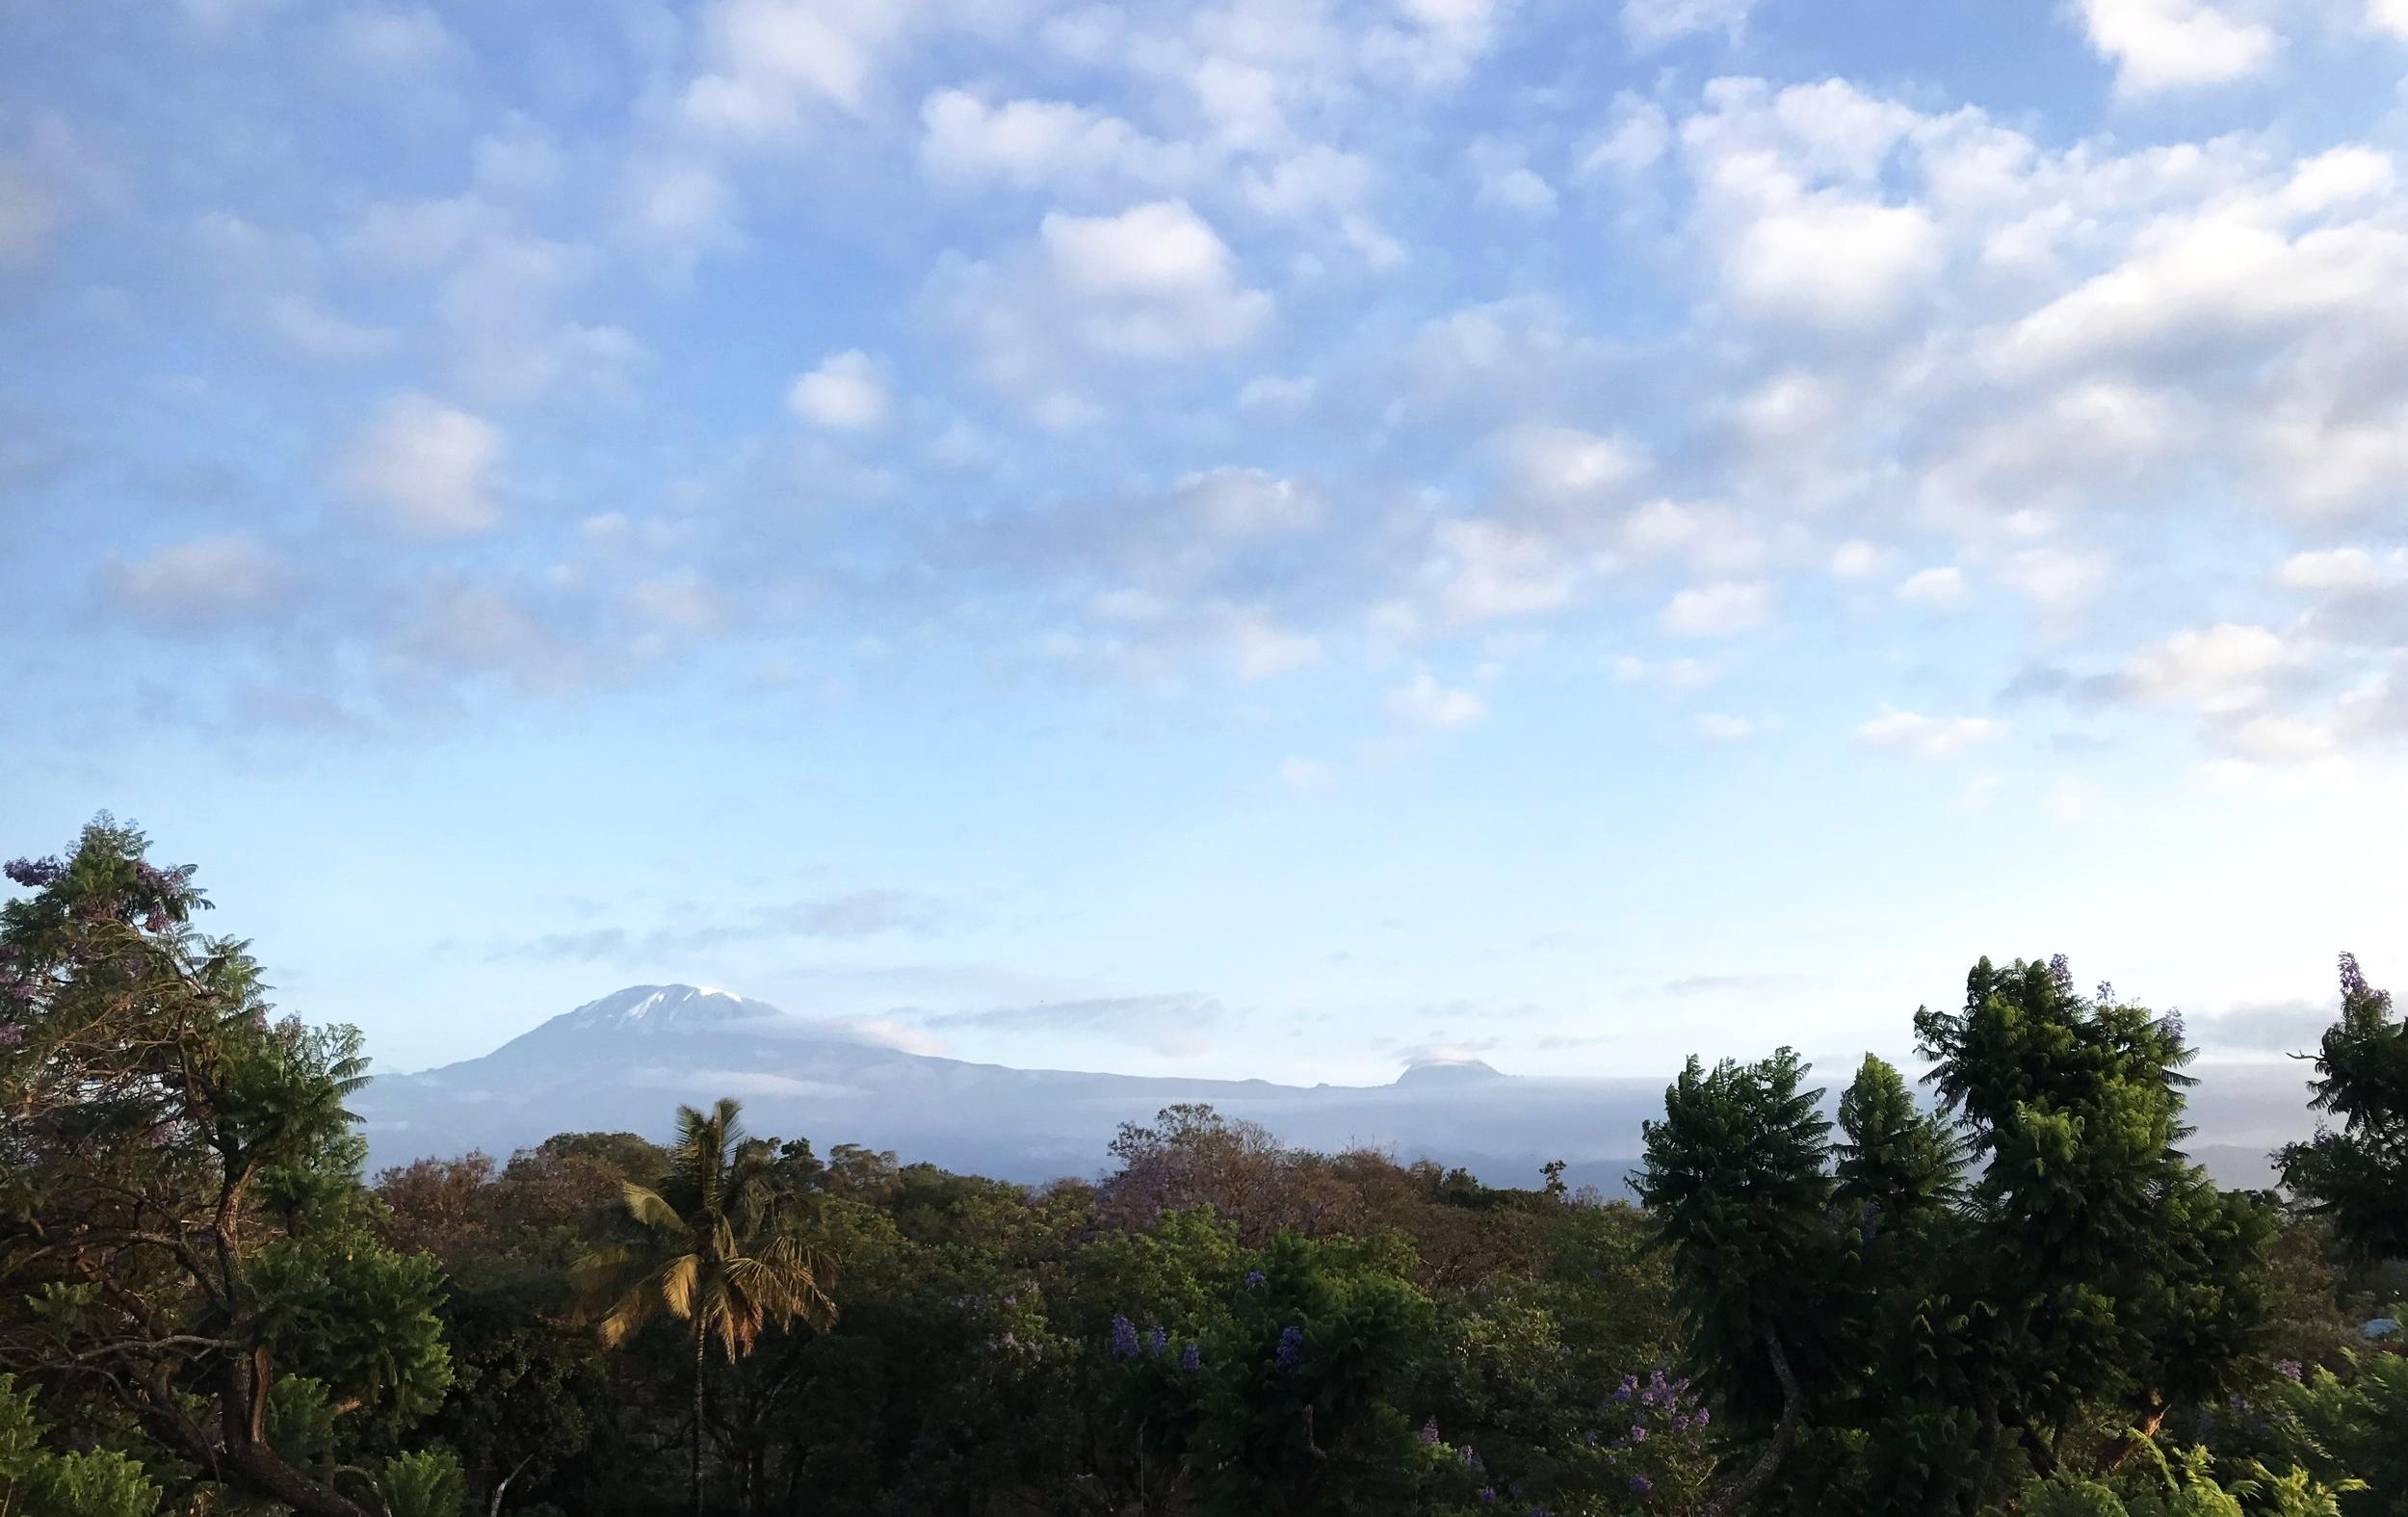 DAY 1:JAMBO KARIBU - MOSHI, TANZANIA